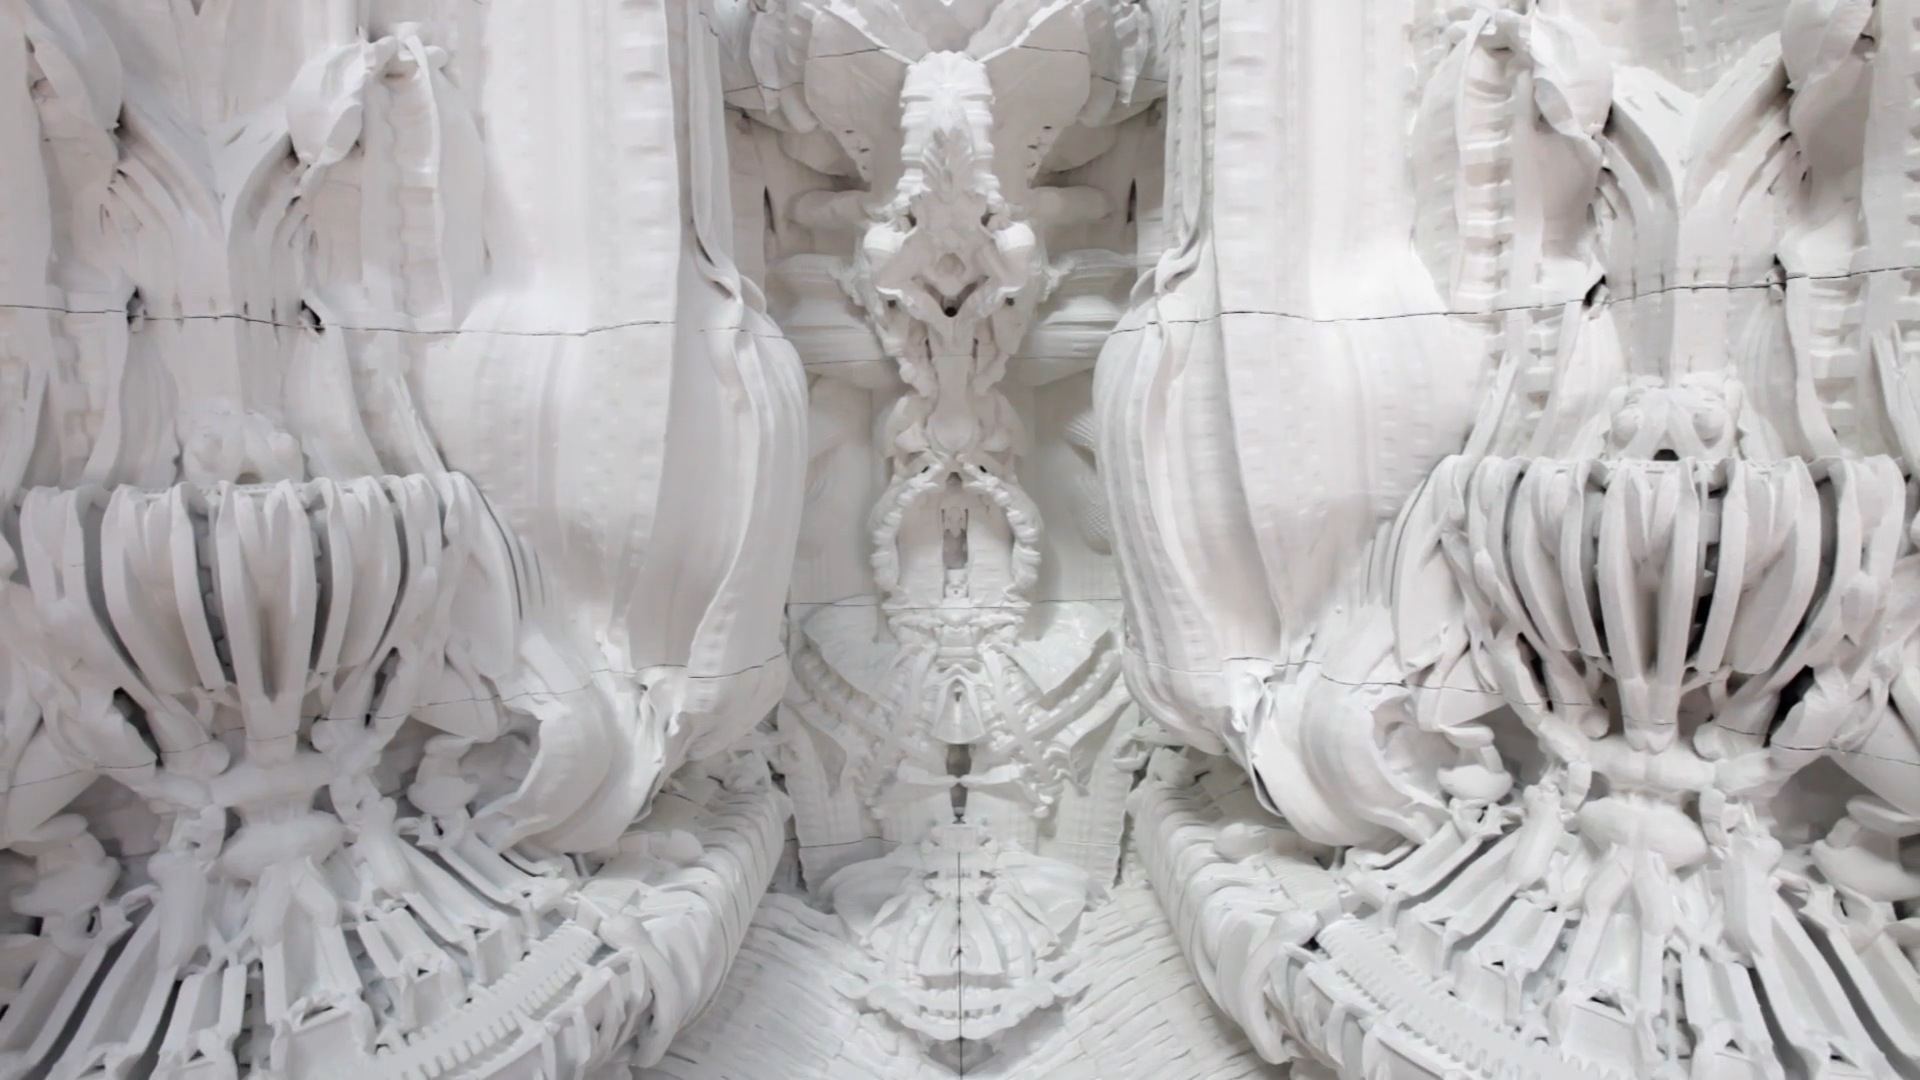 3d Interior Wallpaper Hd Digital Grotesque 3d Printing Architecture Fubiz Media